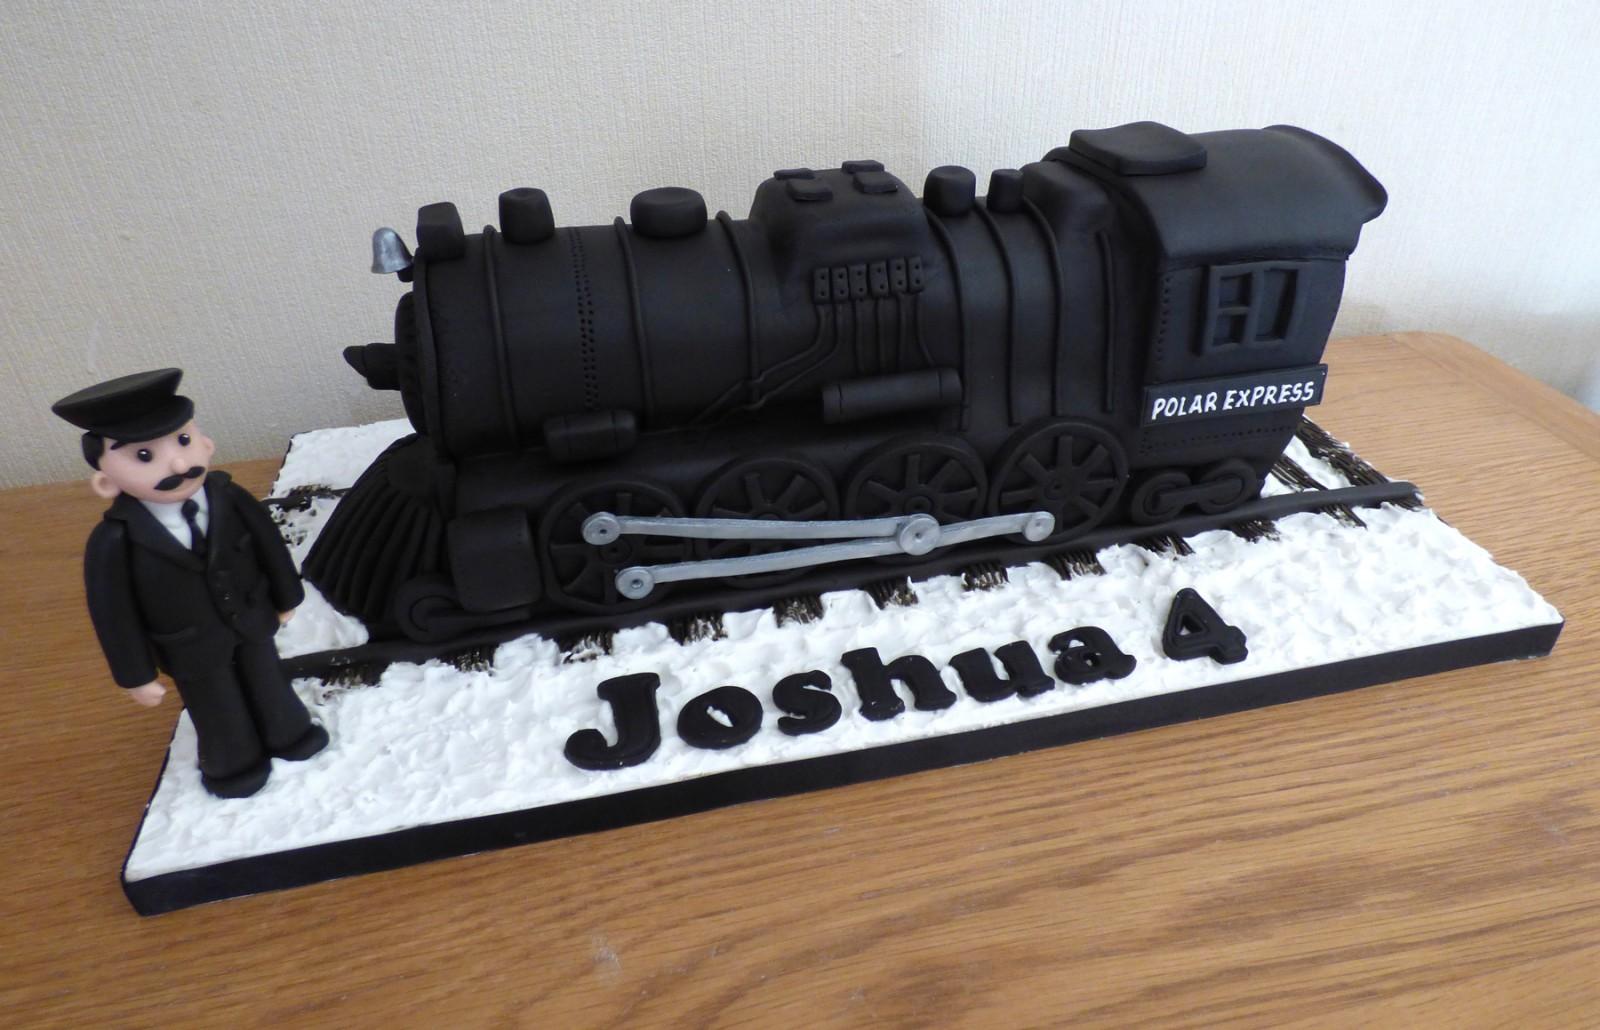 Swell Polar Express Engine Birthday Cake Susies Cakes Funny Birthday Cards Online Fluifree Goldxyz